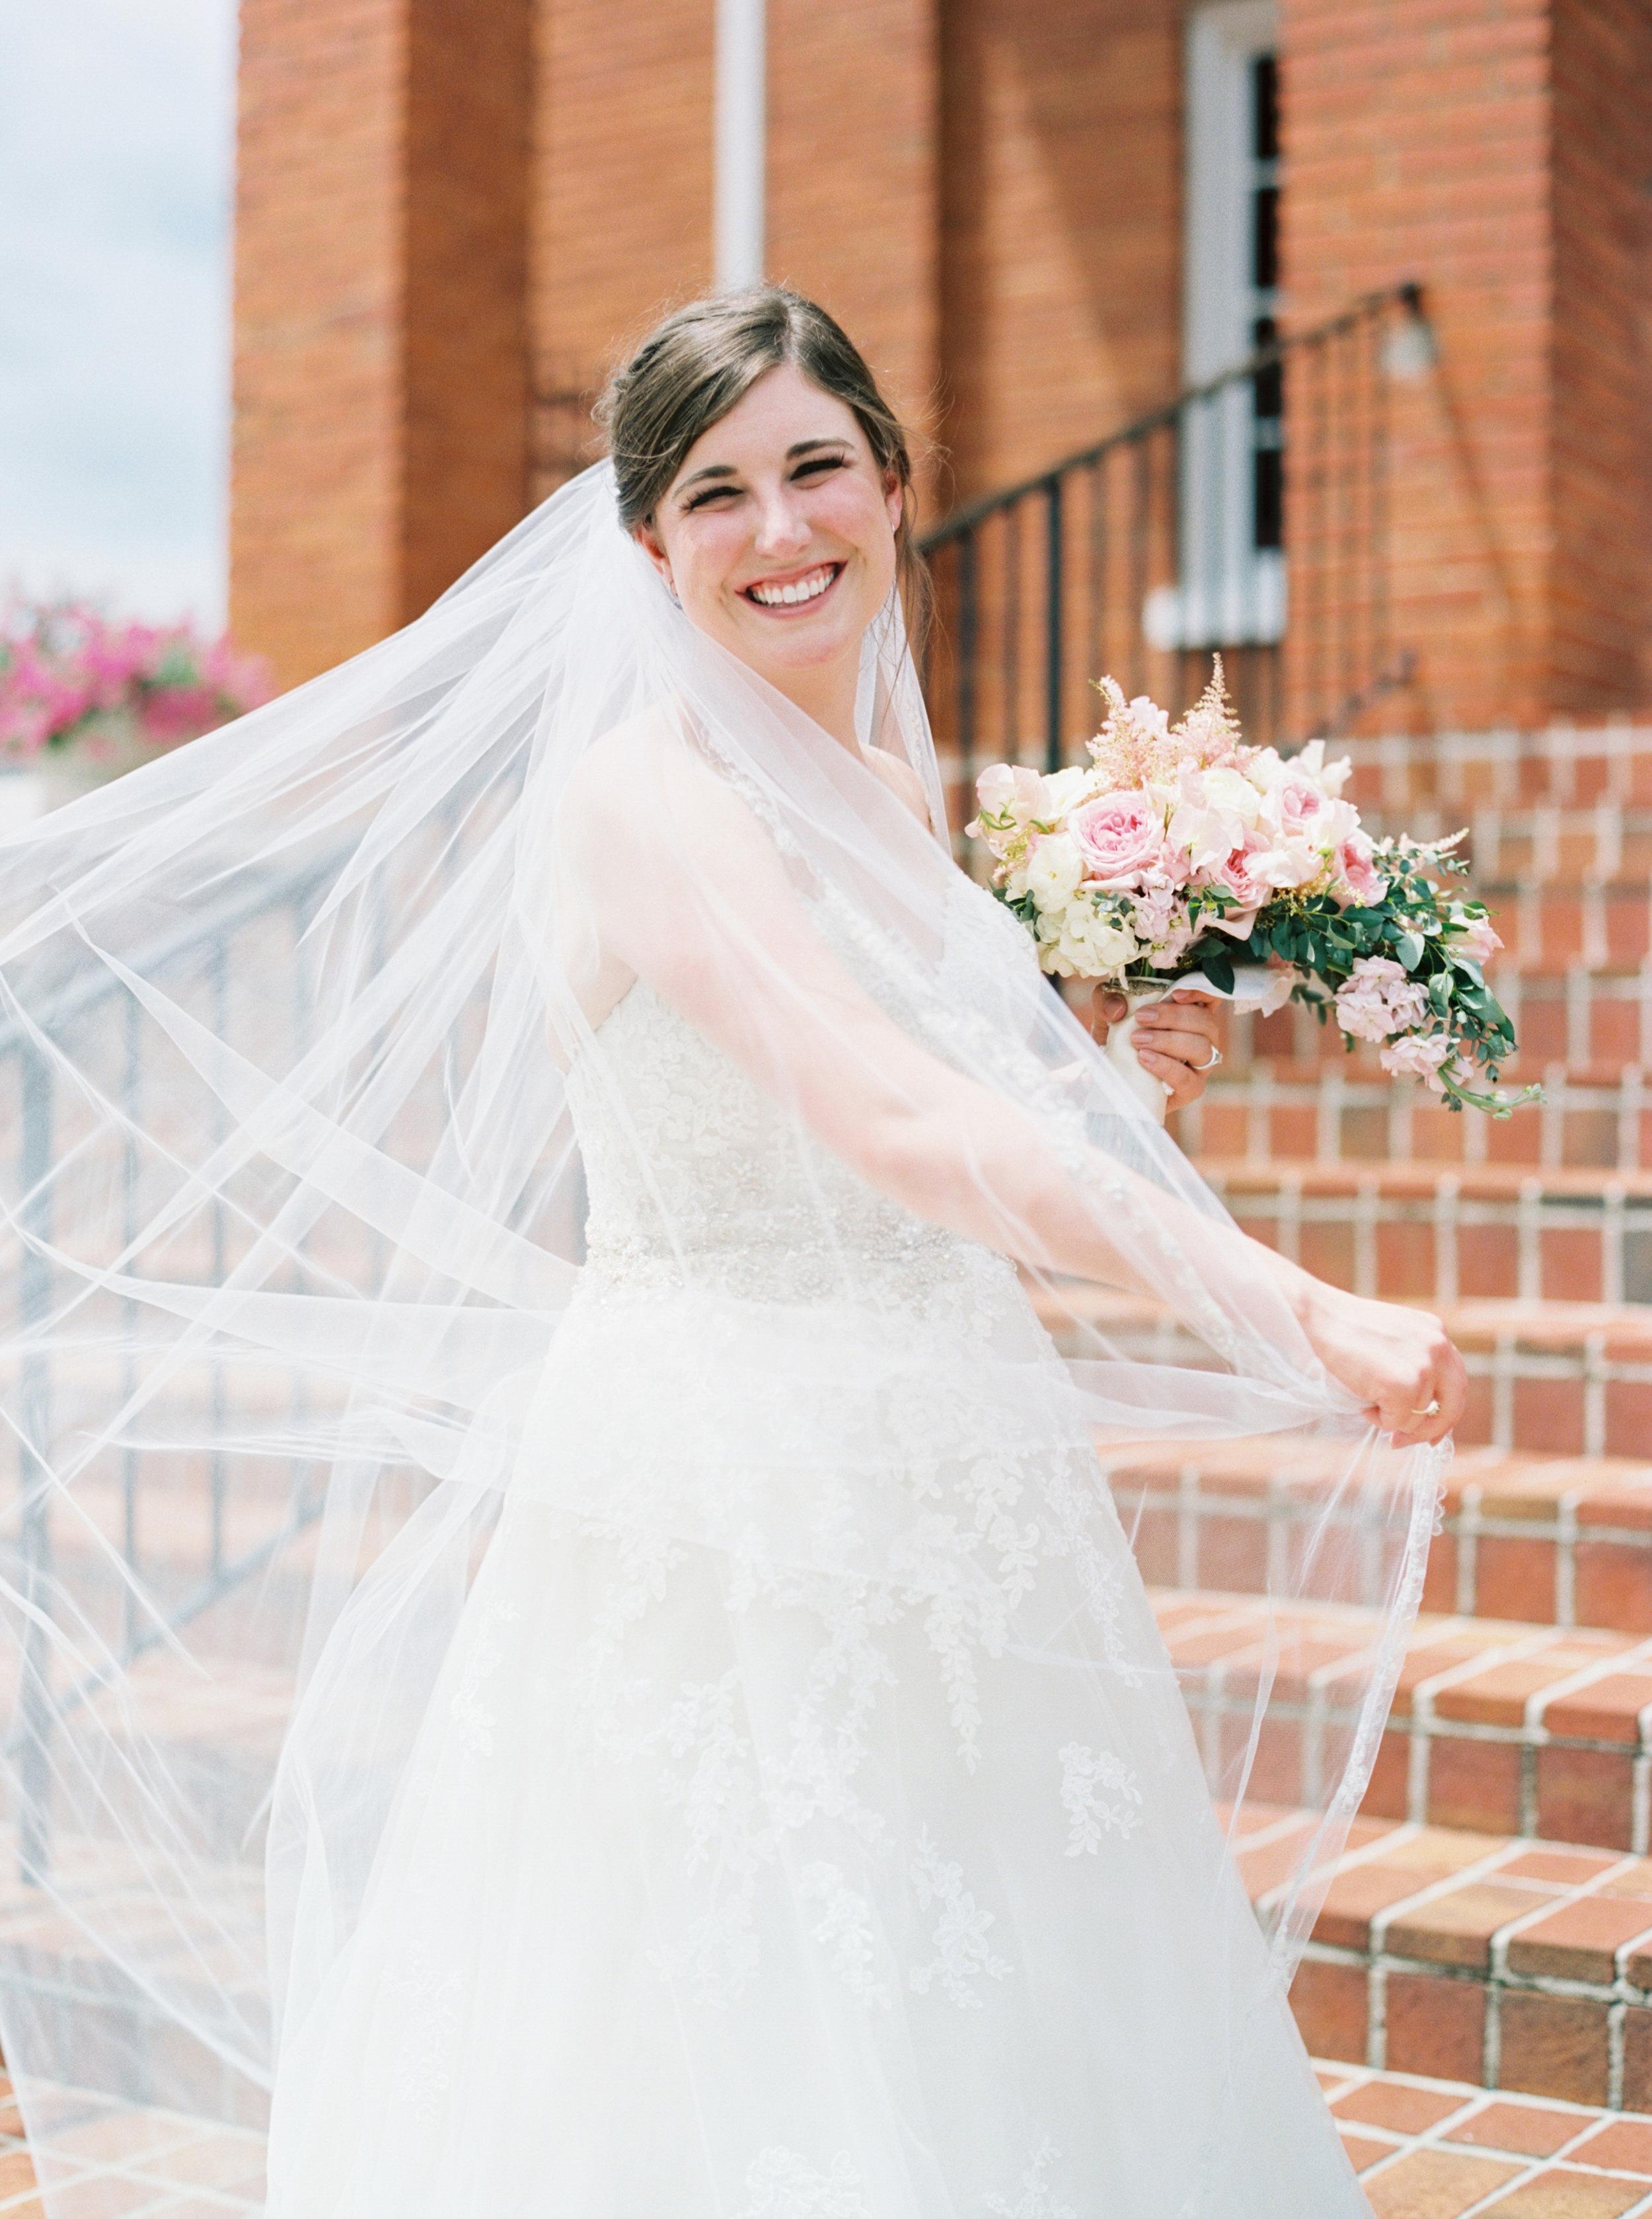 Lydia_johnathan_Wedding_Abigail_Malone_Photography-566.jpg